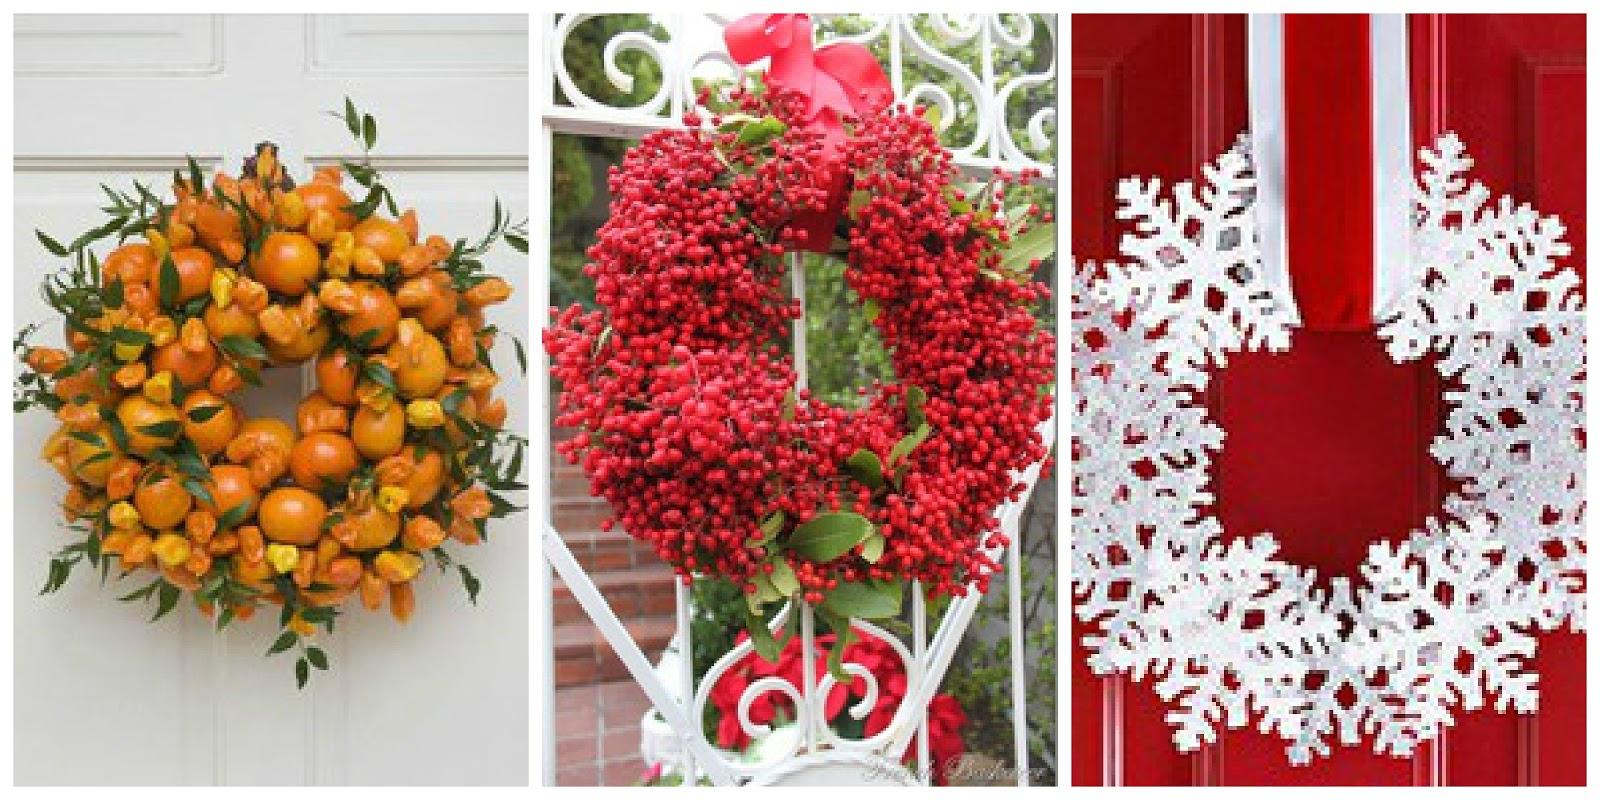 Il giardino di fasti floreali ghirlande natalizie come for Ghirlande natalizie di carta